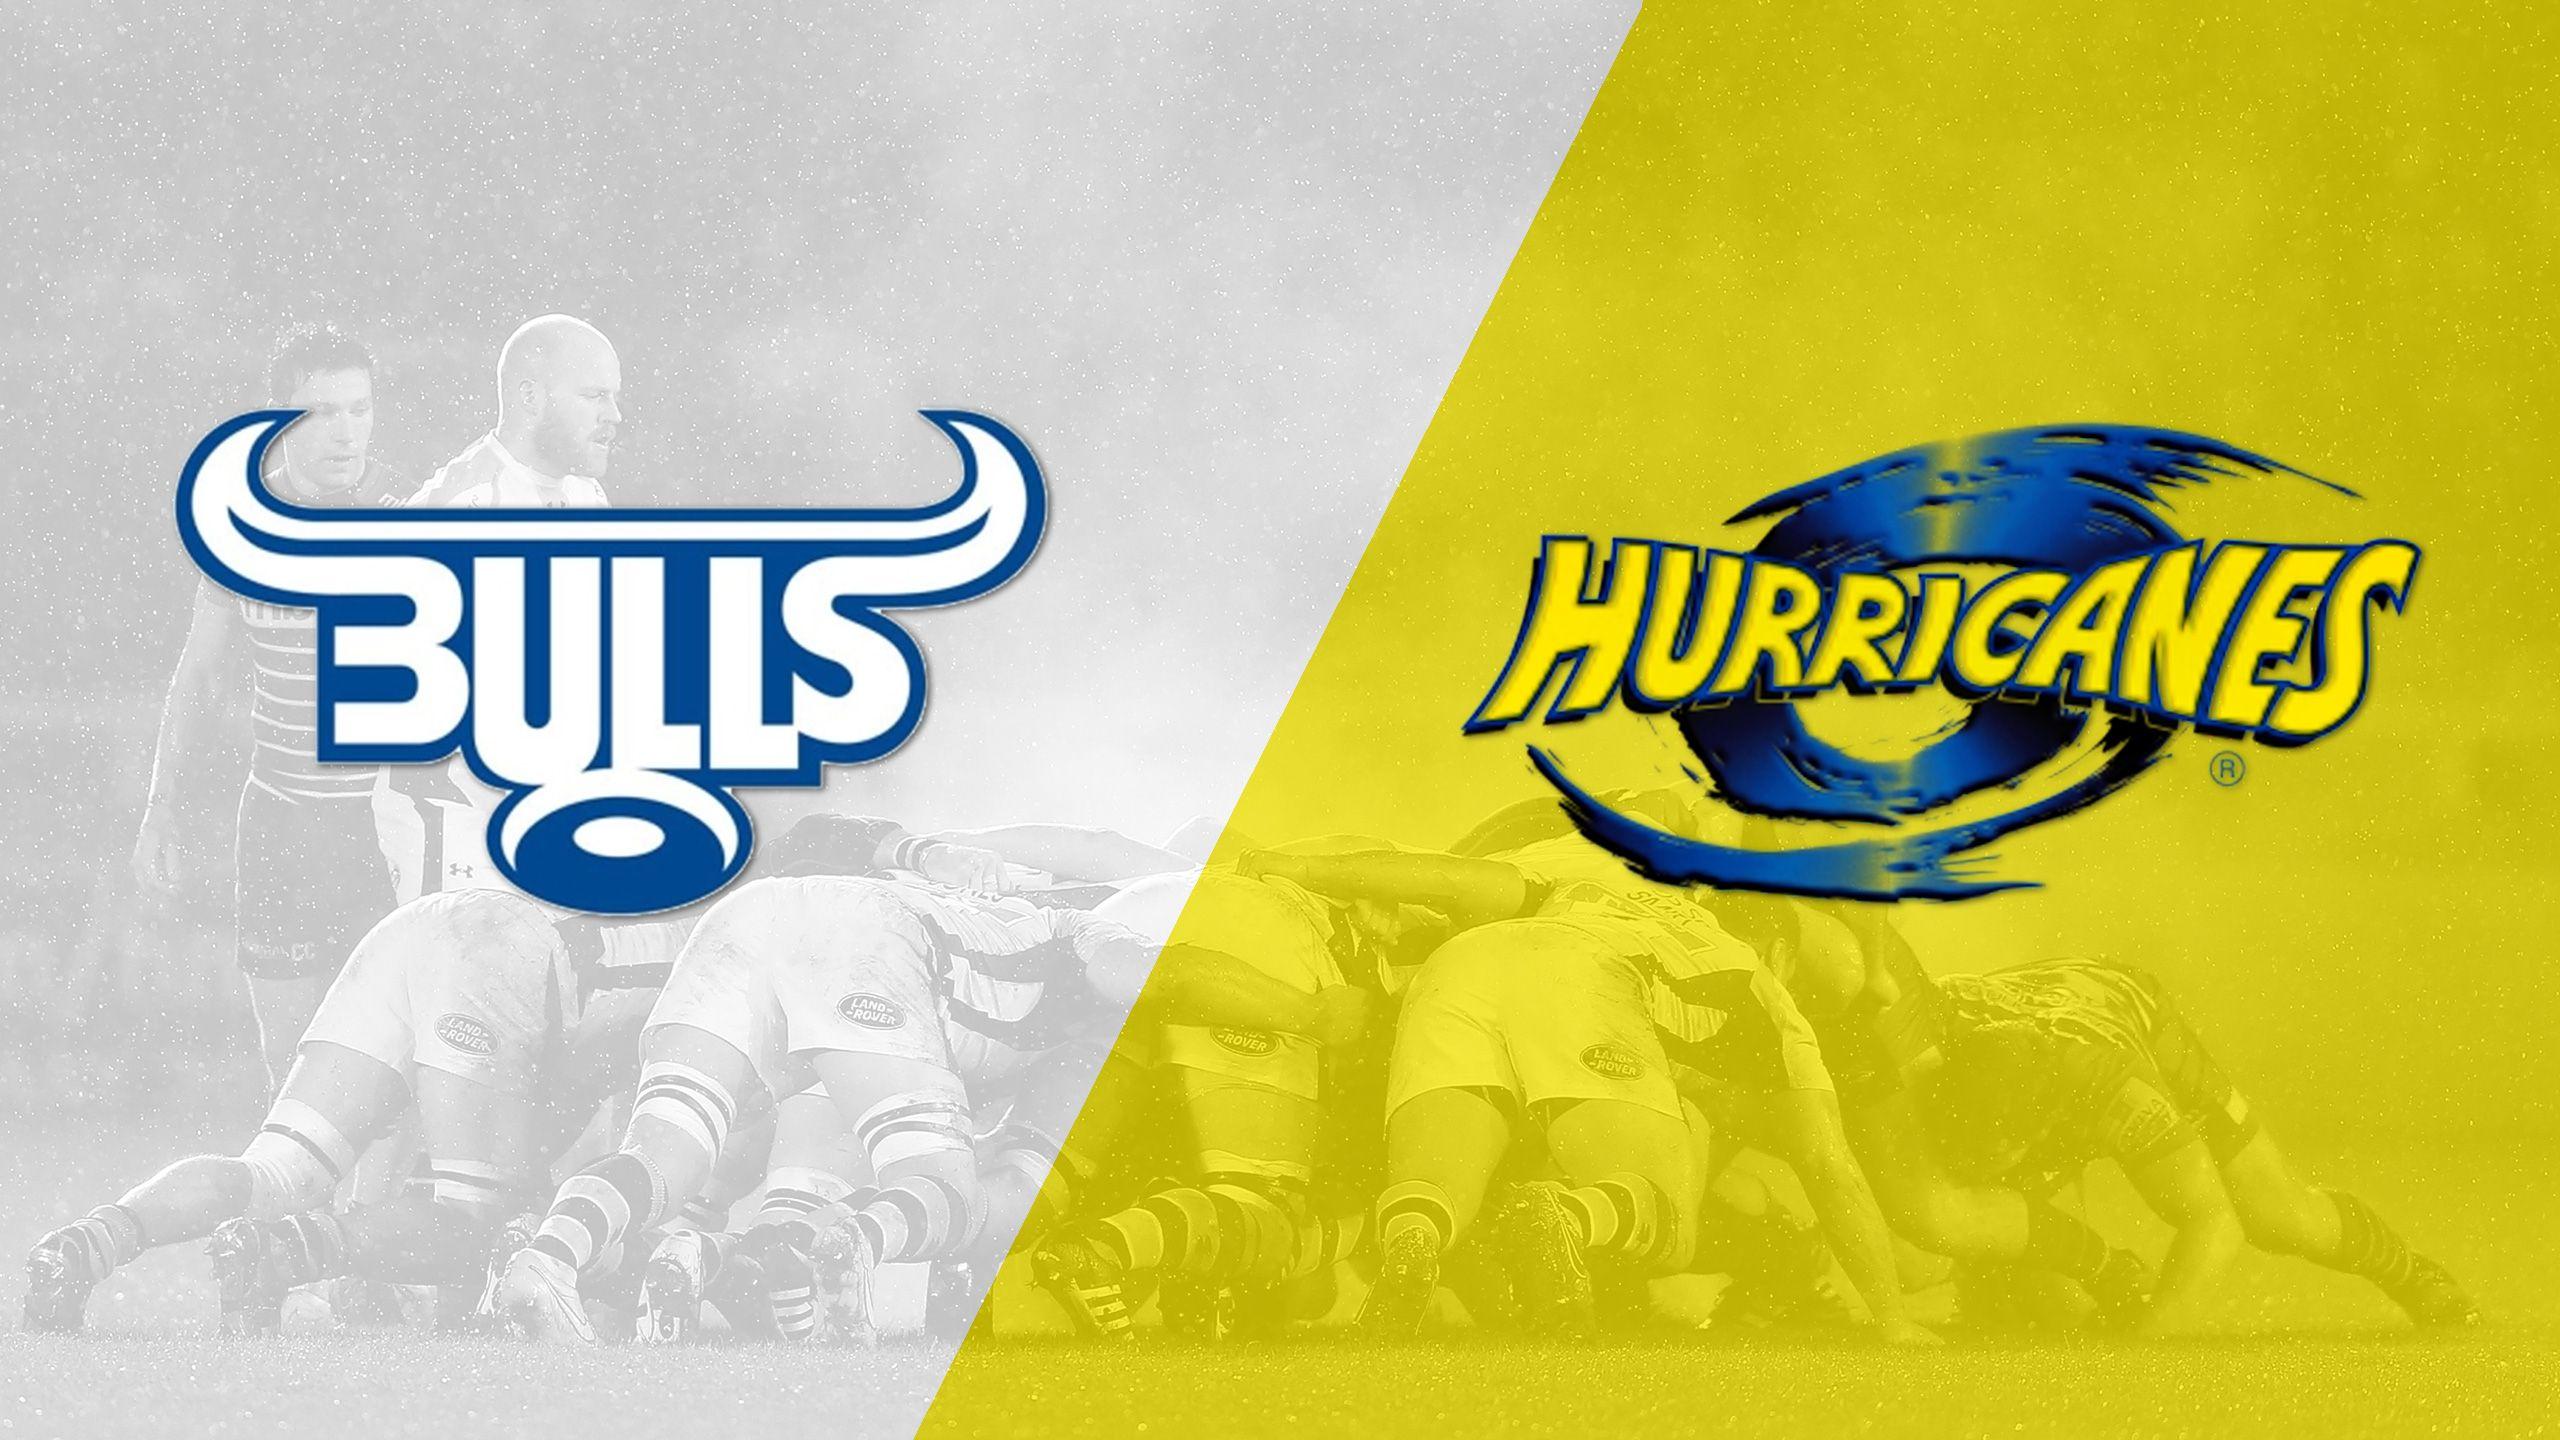 Bulls vs. Hurricanes (Round 2) (Super Rugby)